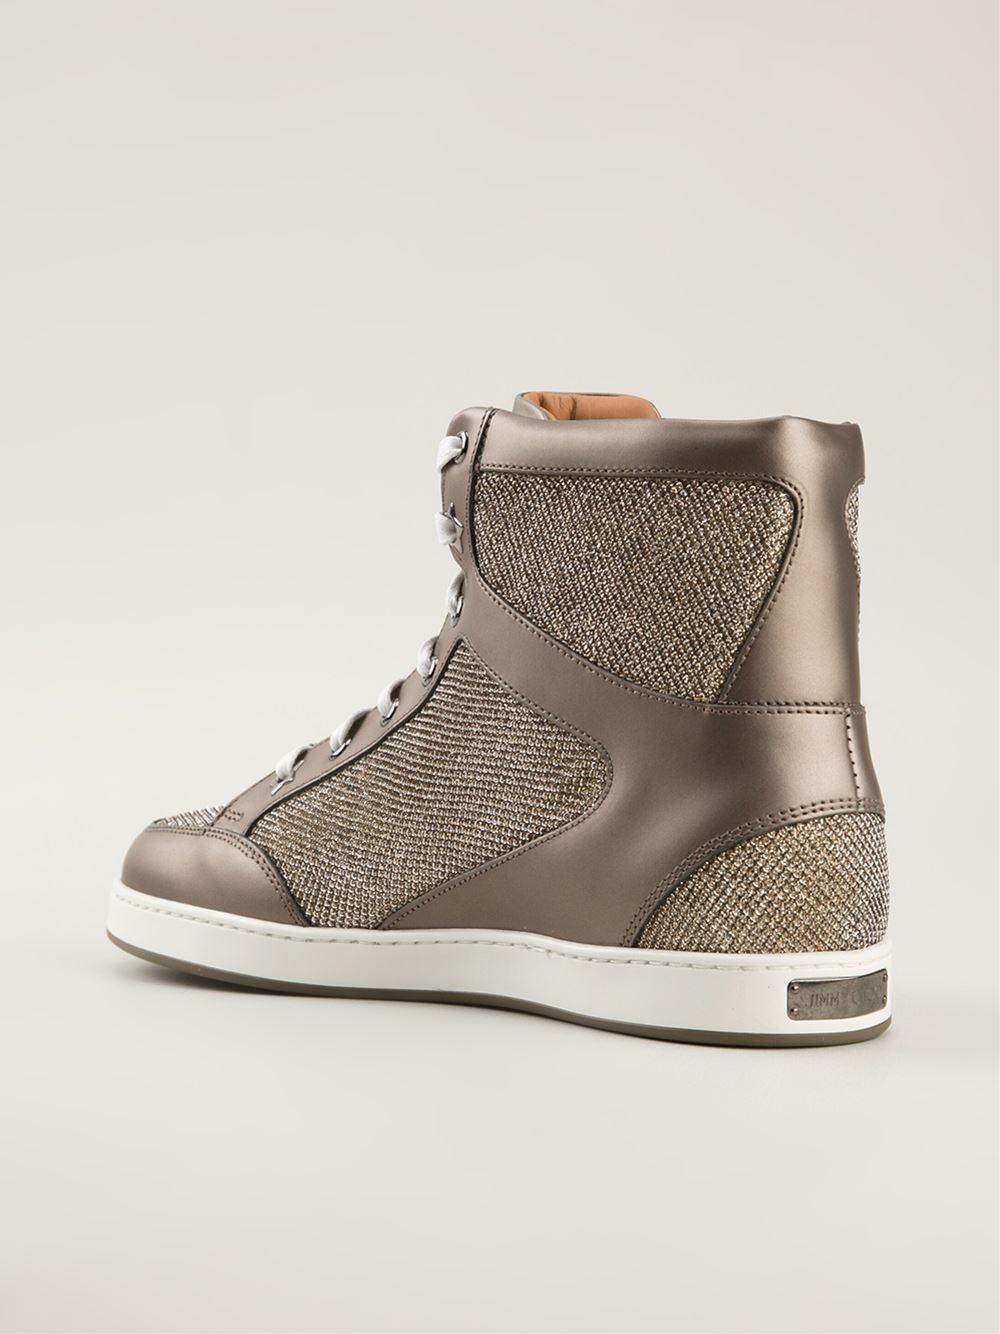 d2782b94320 ... italy lyst jimmy choo tokyo hi top sneakers in metallic 100bb 40120